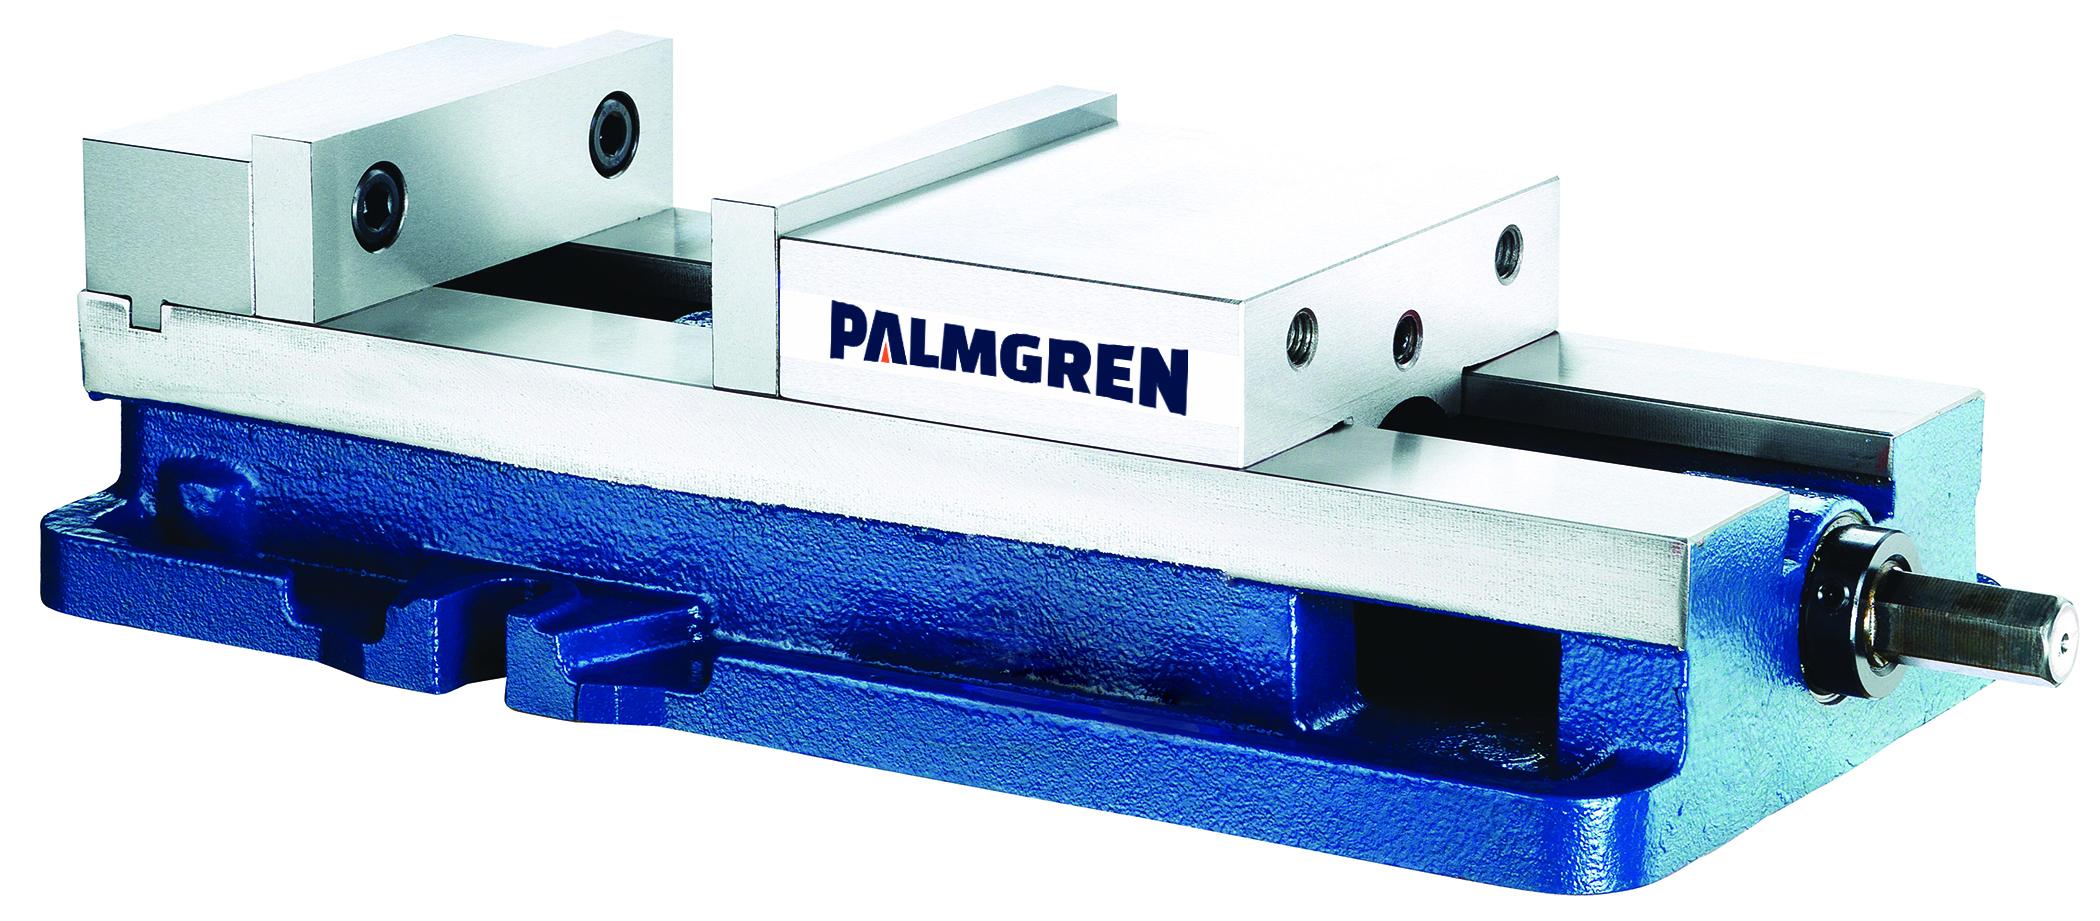 Palmgren 29503 5-Inch Multi-Jaw Bench Vise